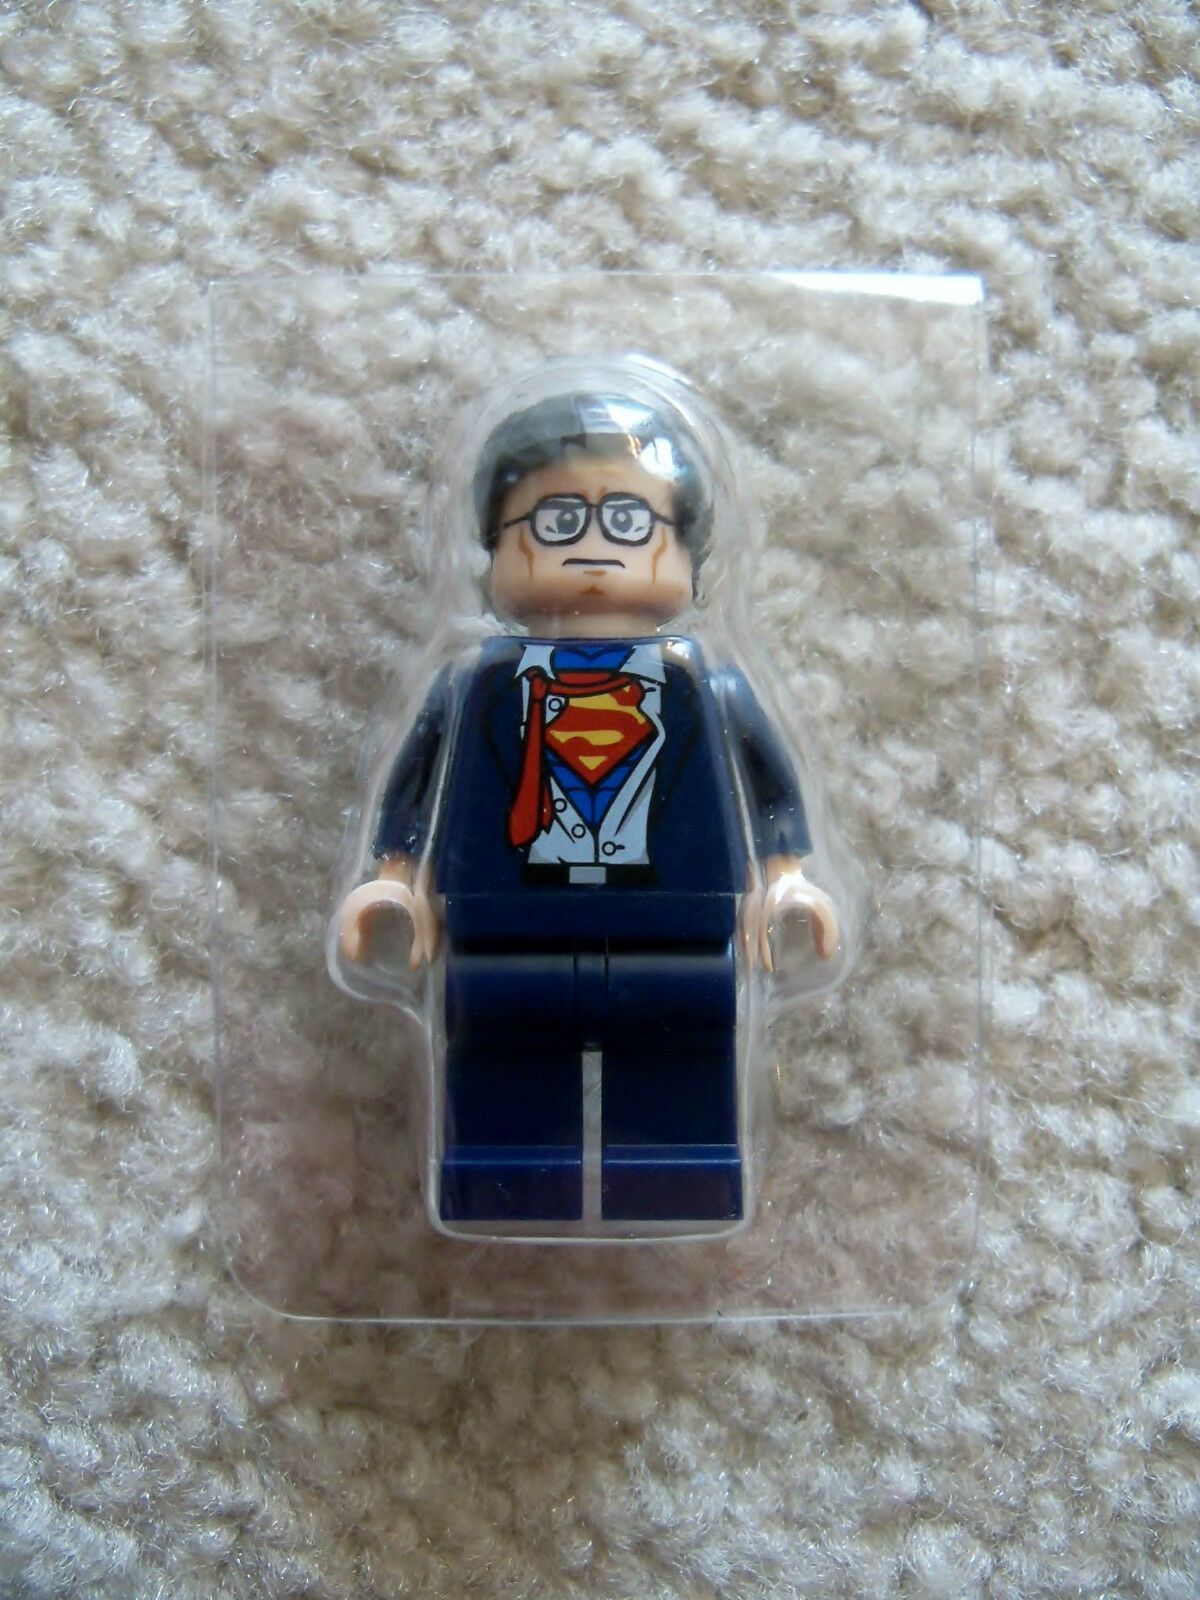 LEGO Superheroes Superman - Rare - Original - Clark Kent Minifig - New